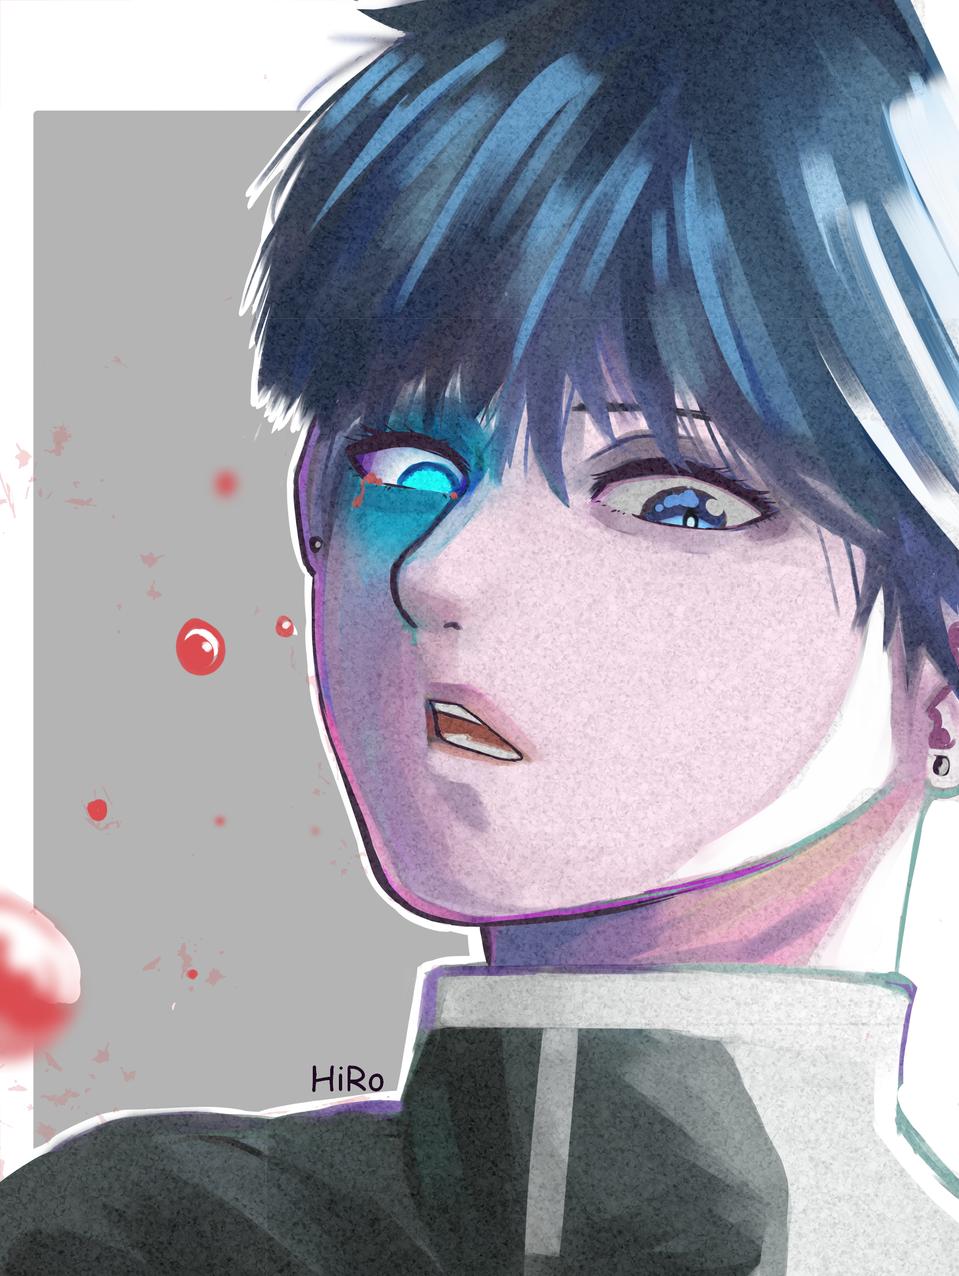 BOY Illust of H i R o horror anime beautiful blue boy medibangpaint illustration shonen oc digital